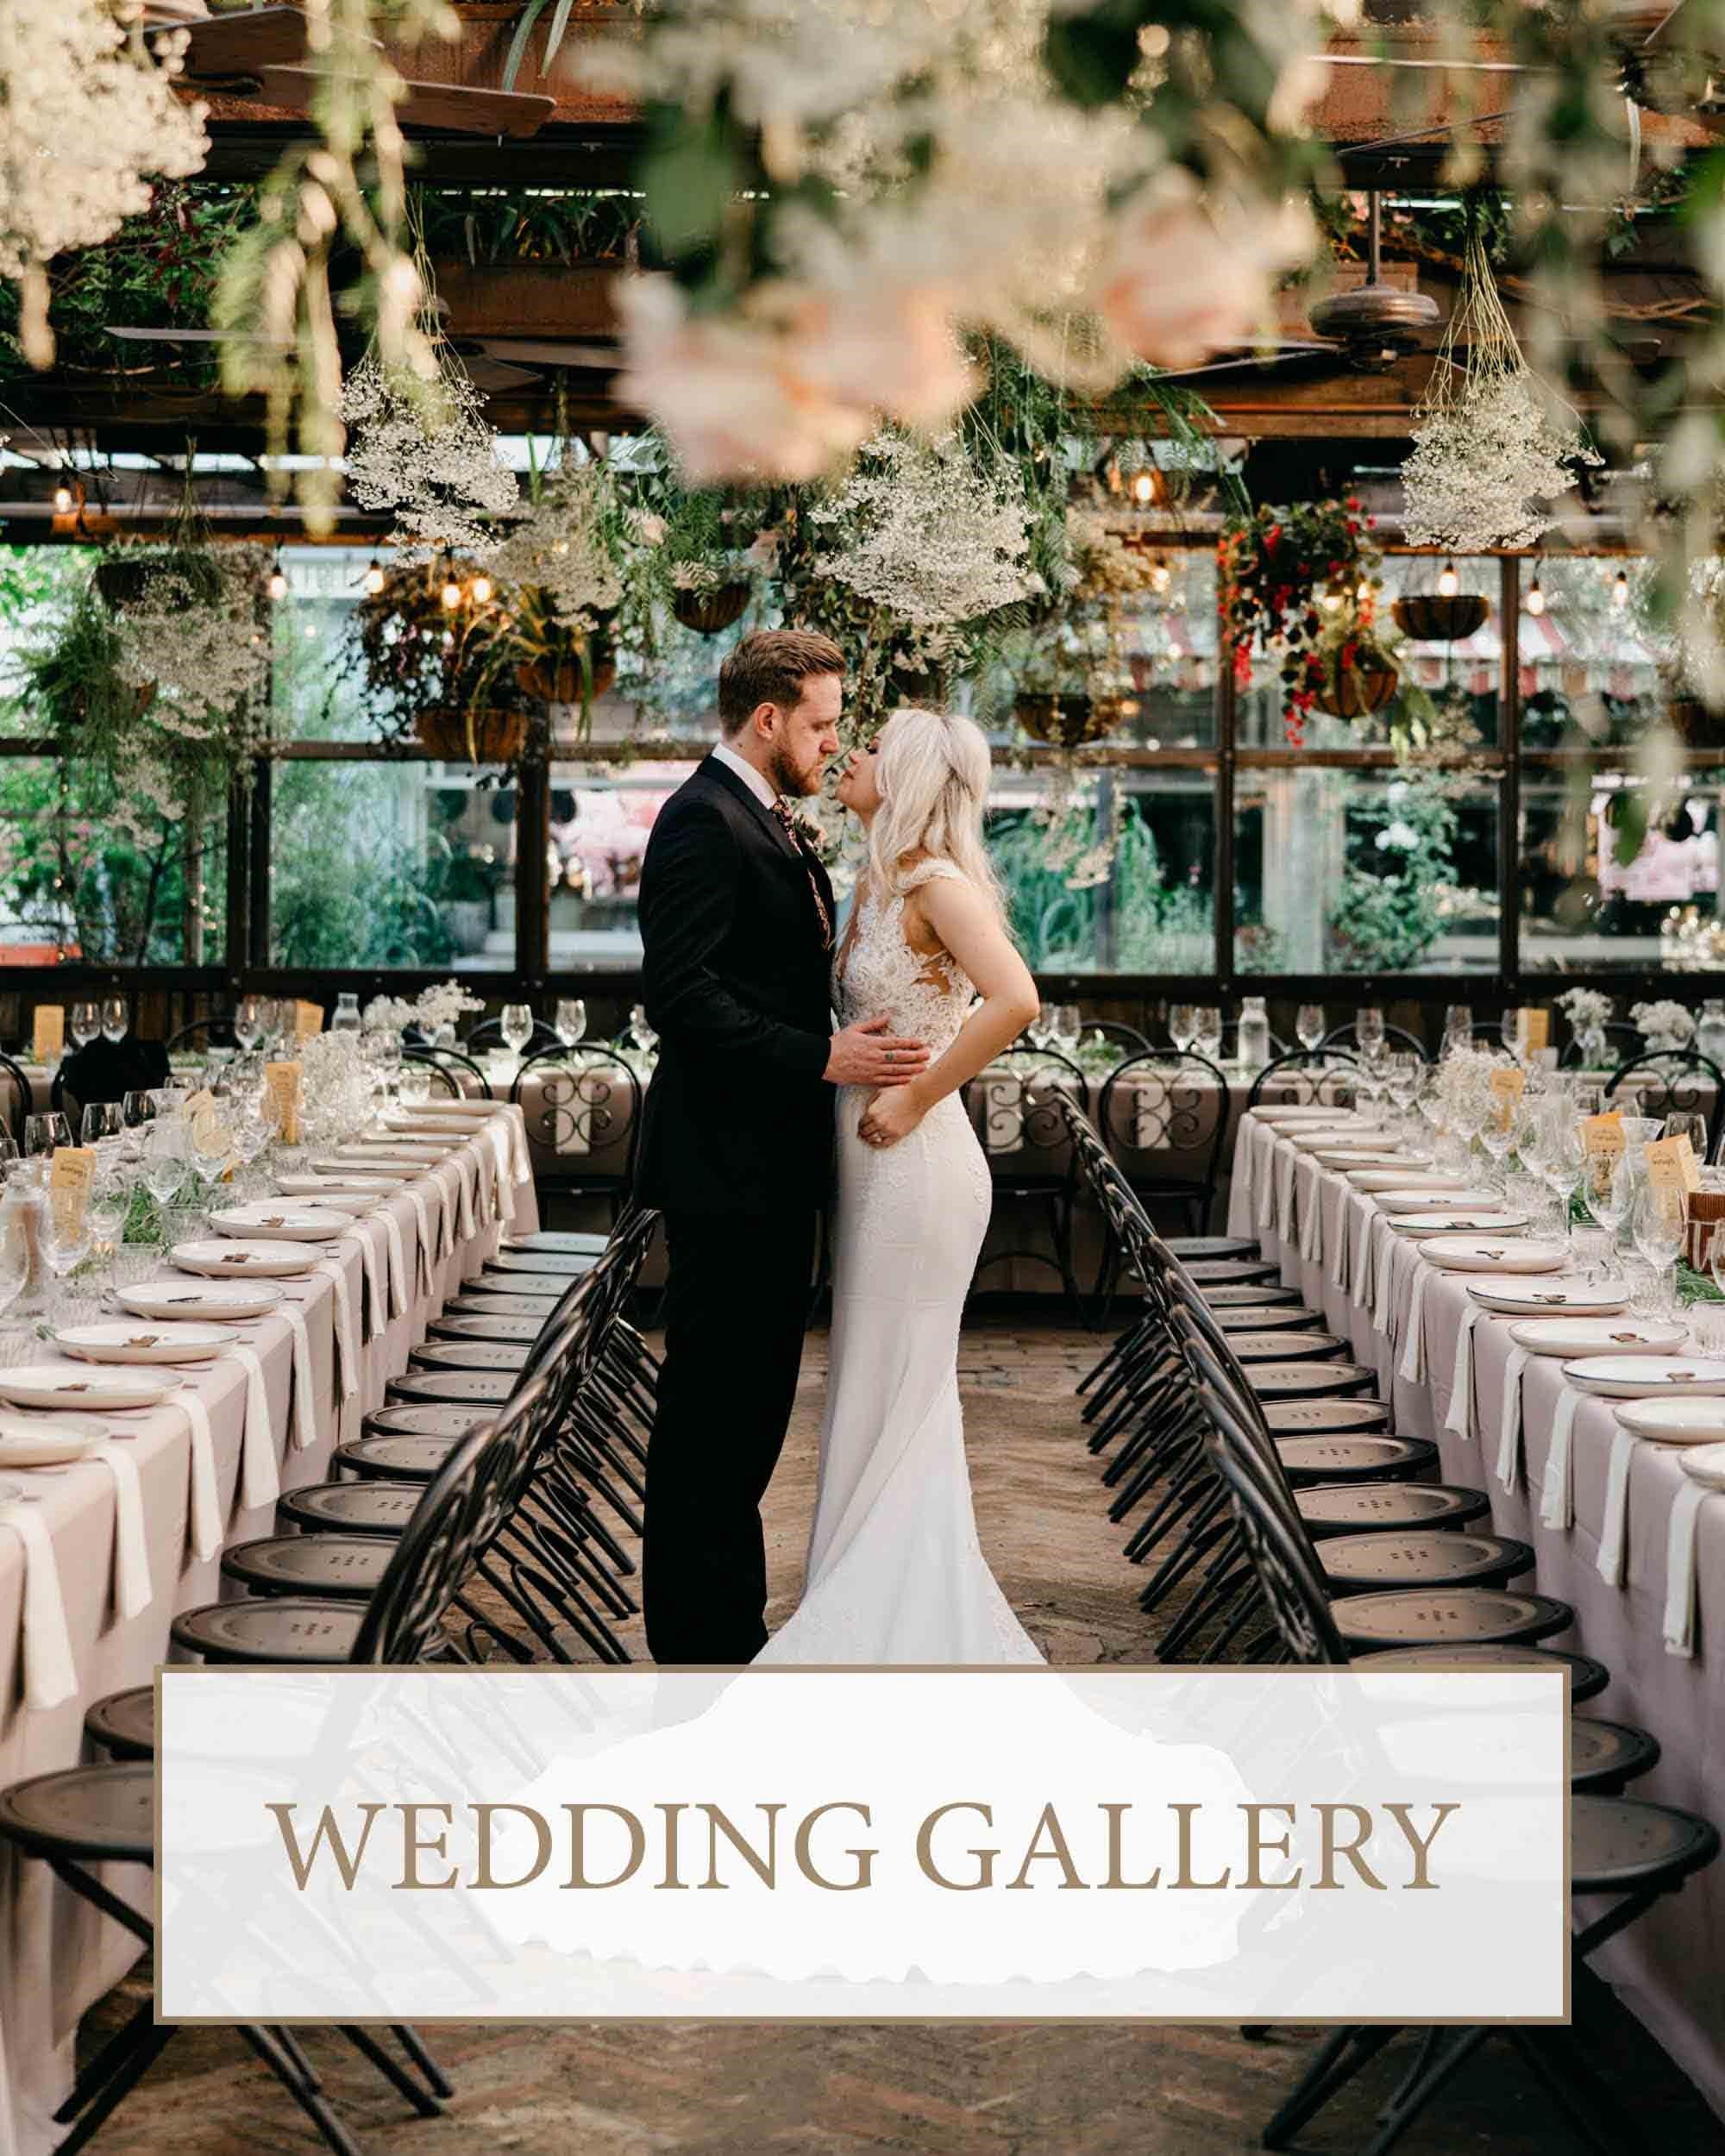 Sydney Wedding Photography Gallery